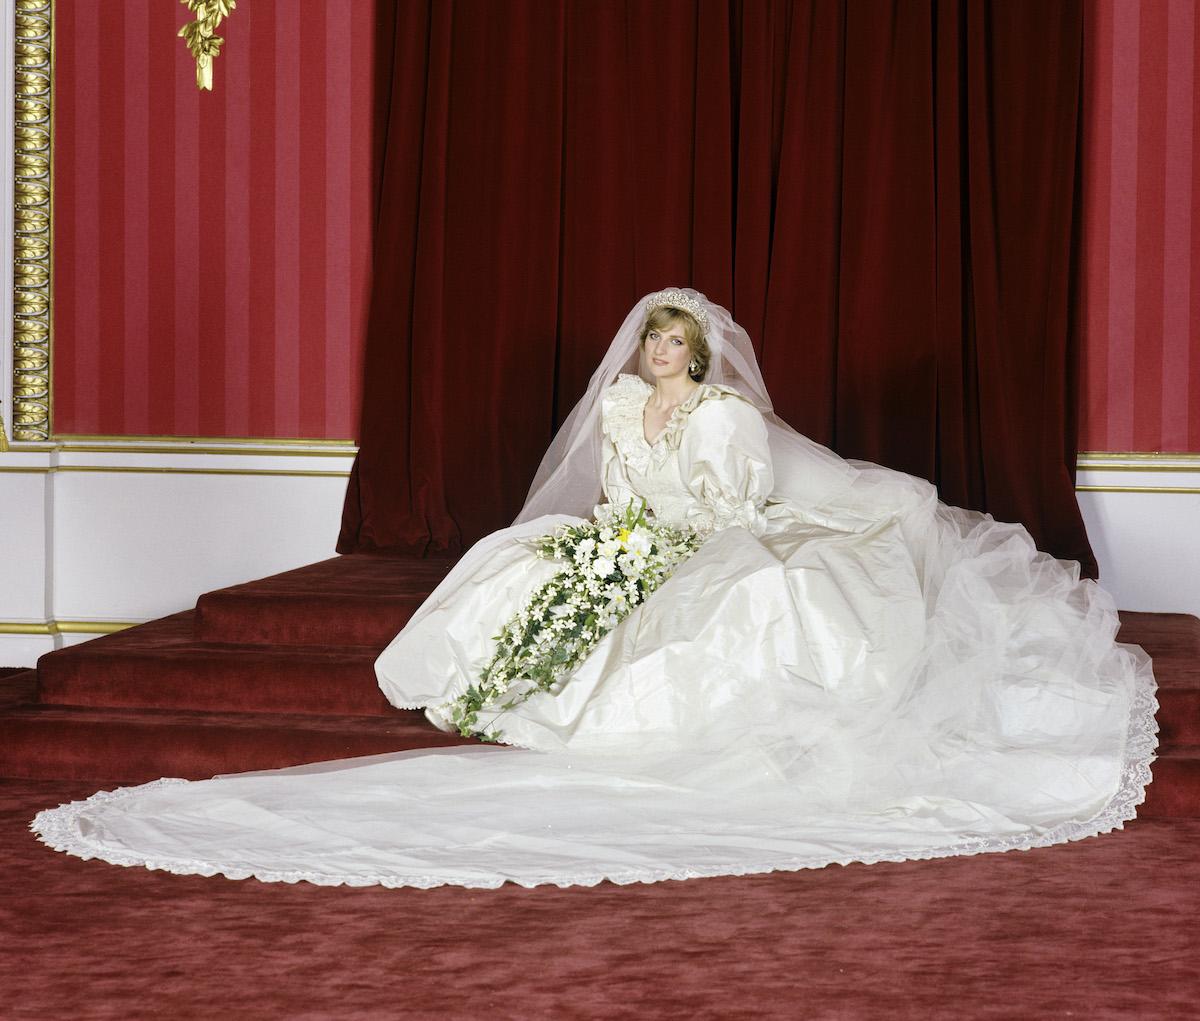 Princess Of Wales Wedding Sitting